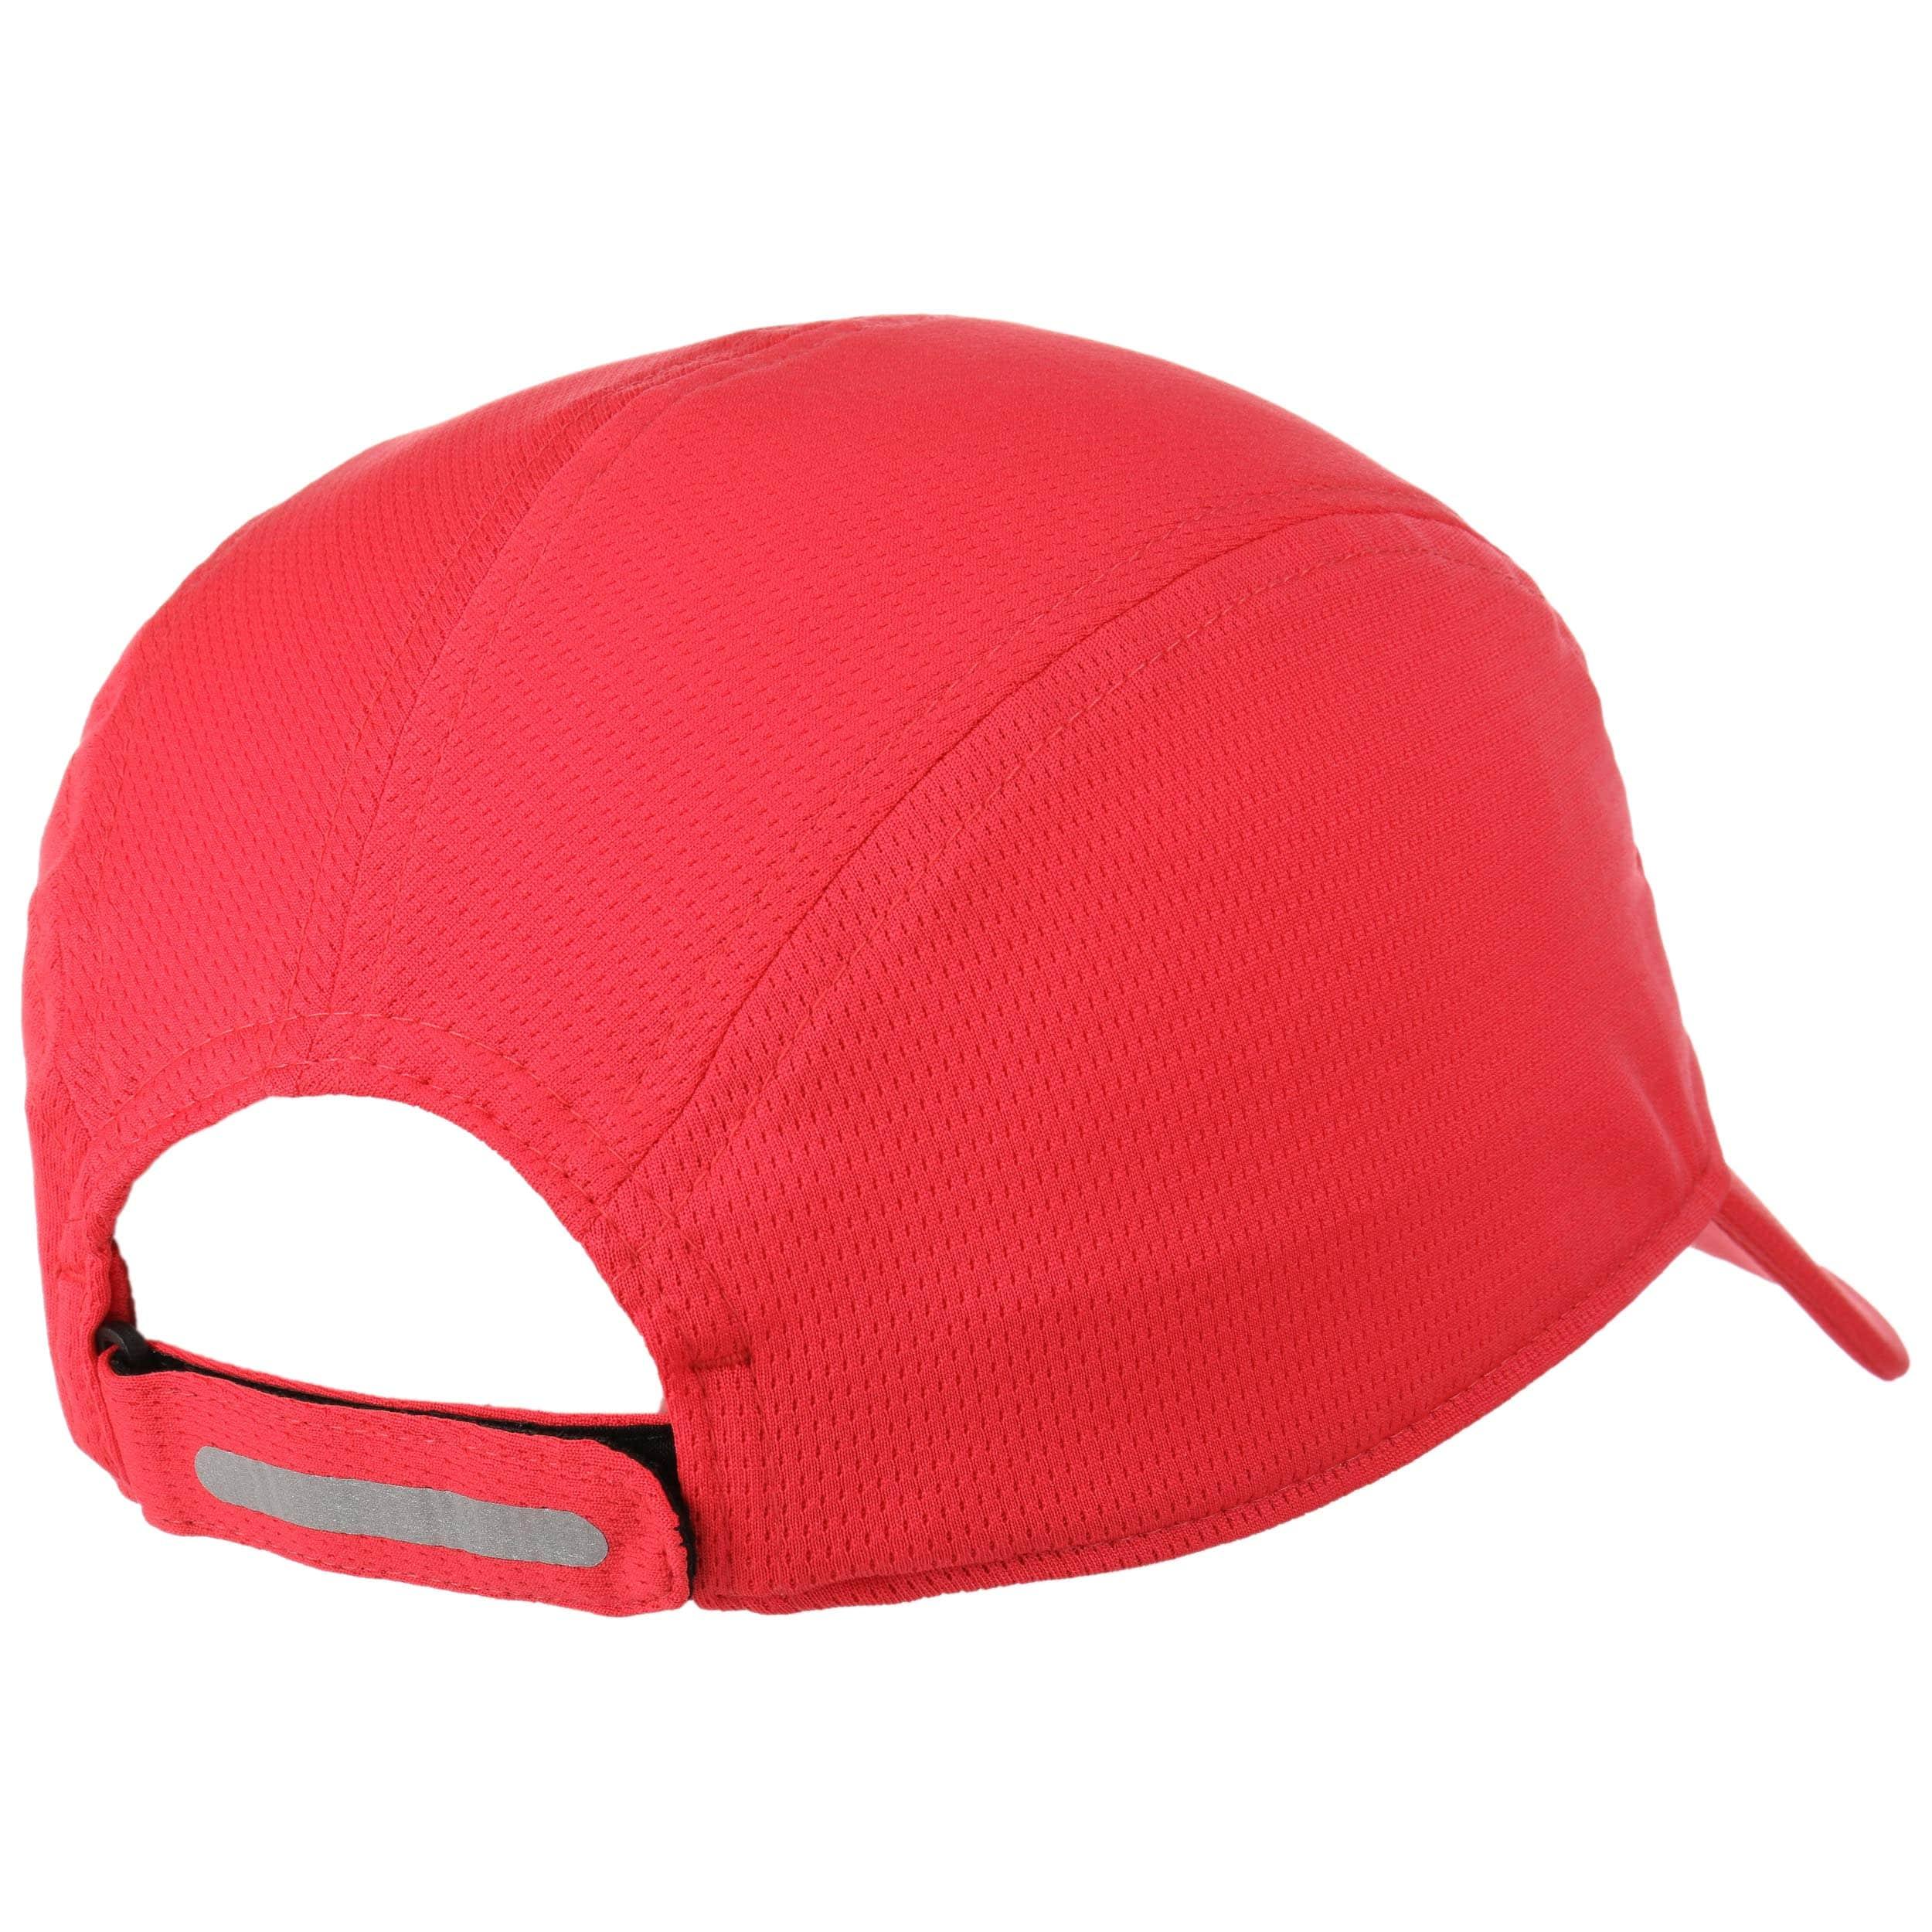 Gorra Climacool Running by adidas - Gorras - sombreroshop.es 831617ee7c0